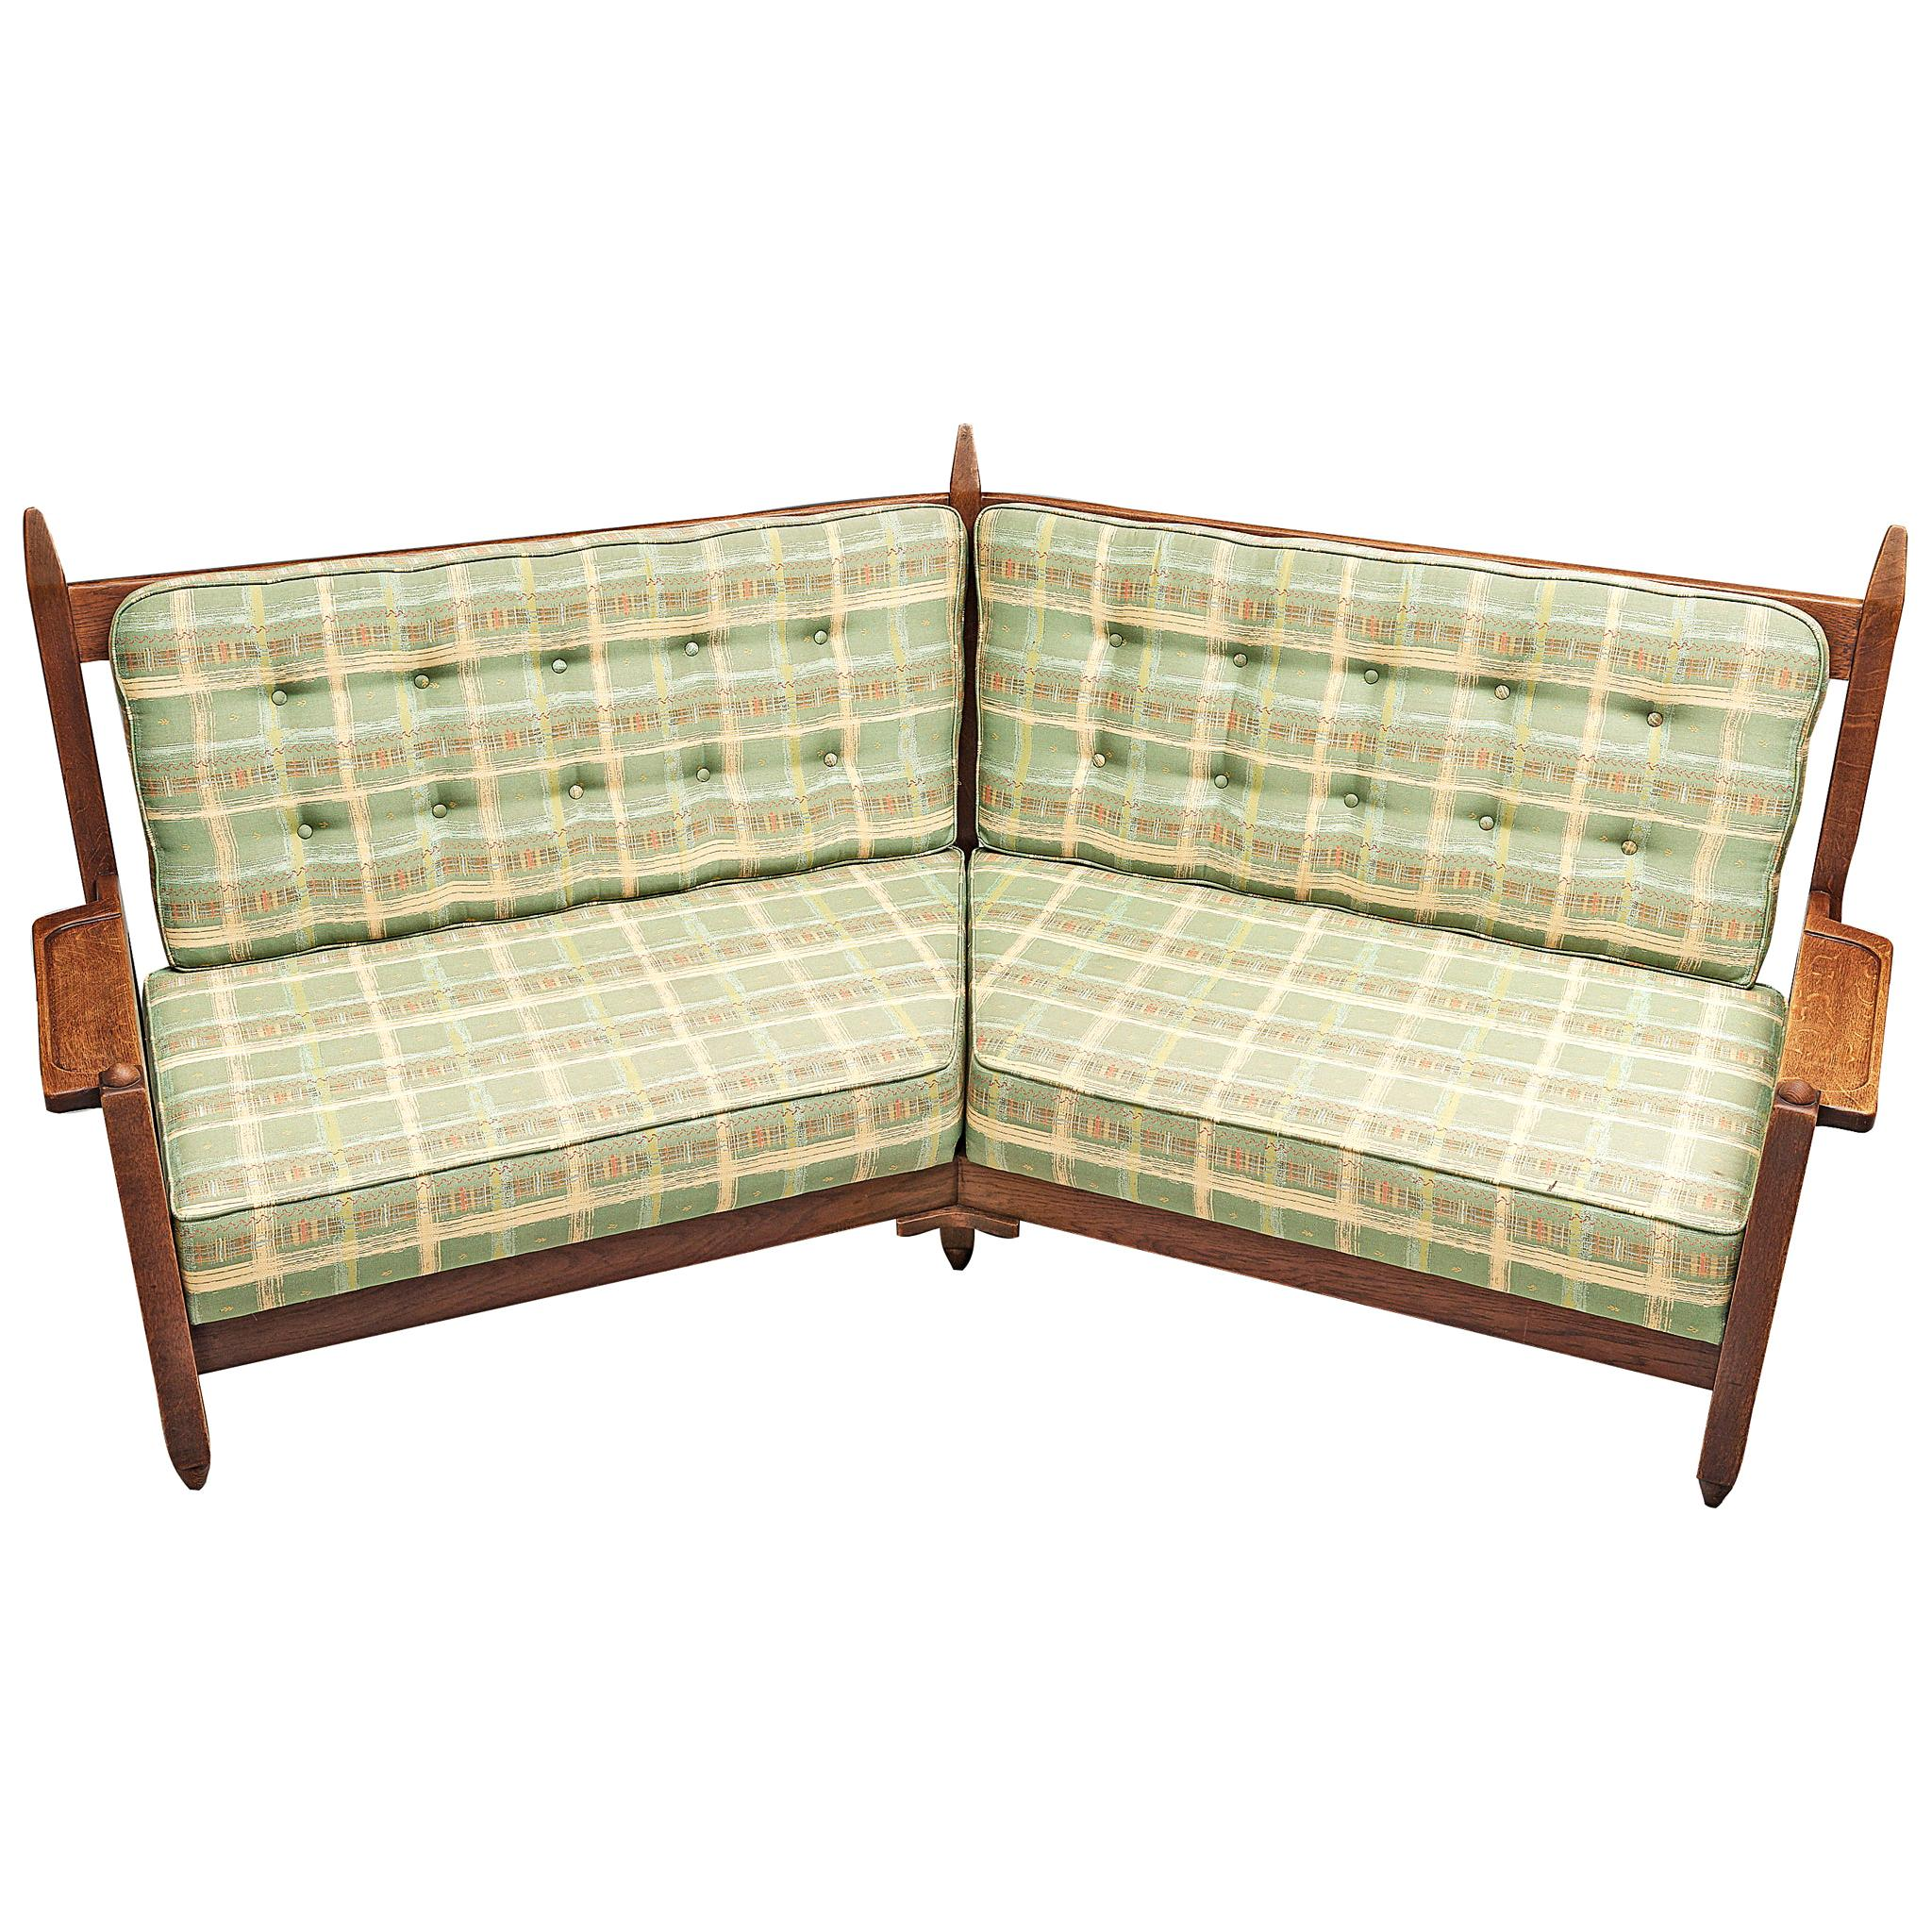 Guillerme et Chambron Angular Sofa in Oak